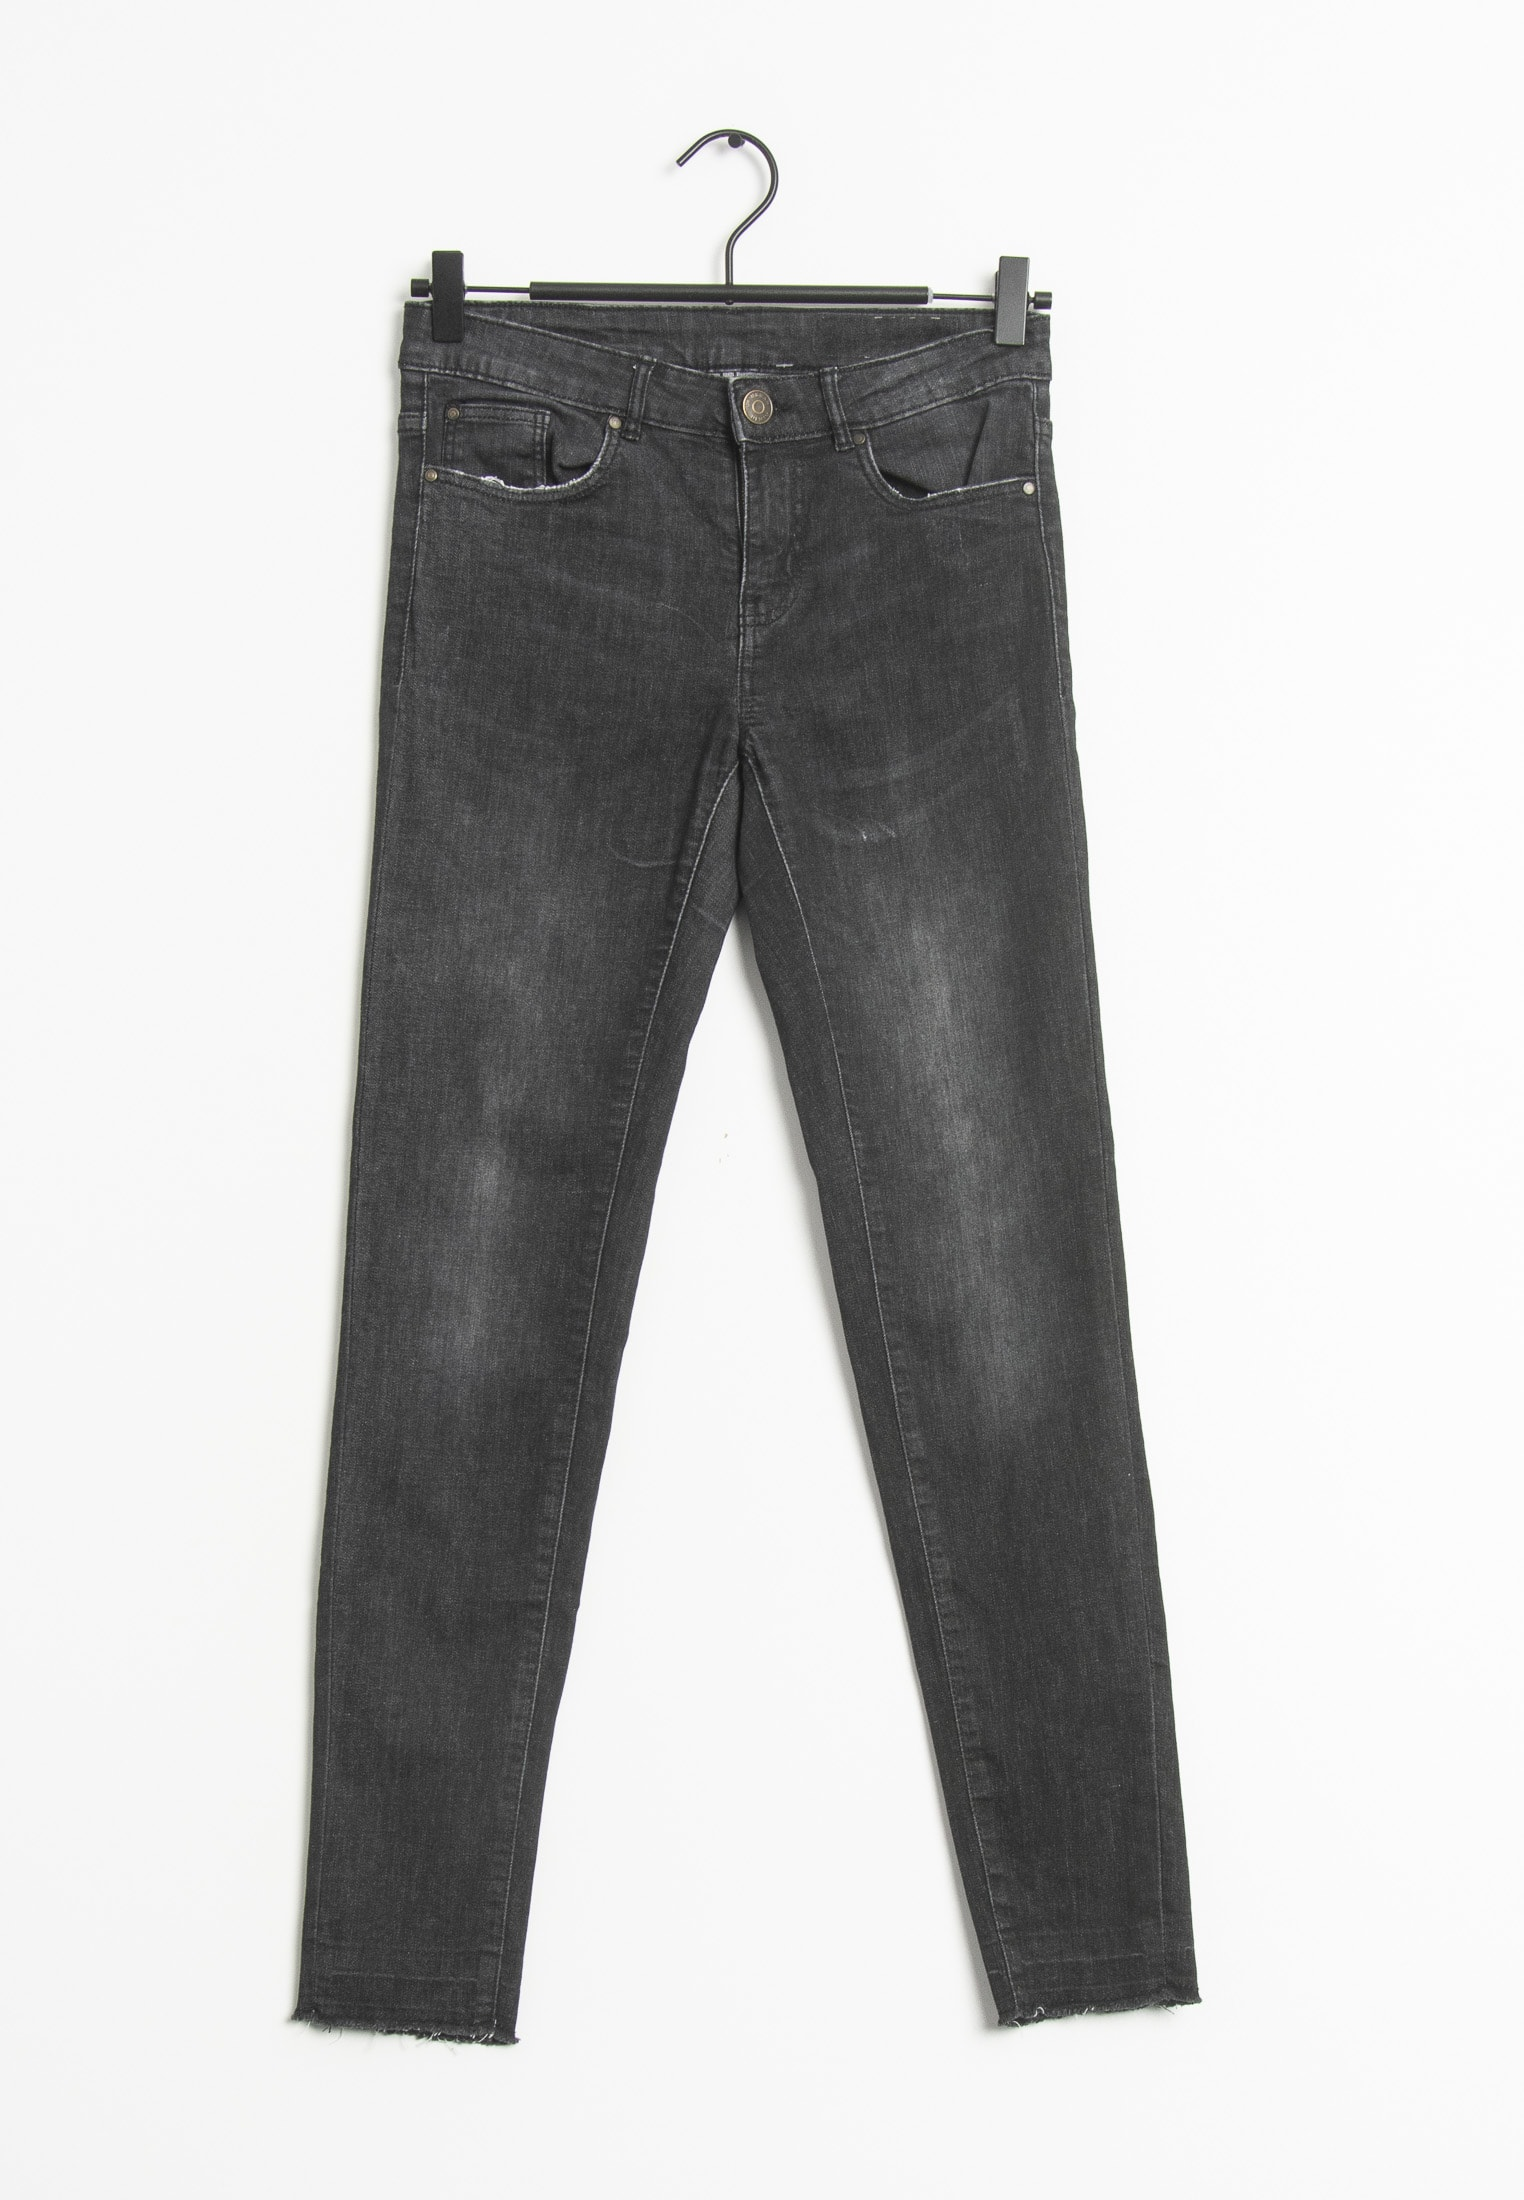 Hilfiger Denim Jeans Blau Gr.S